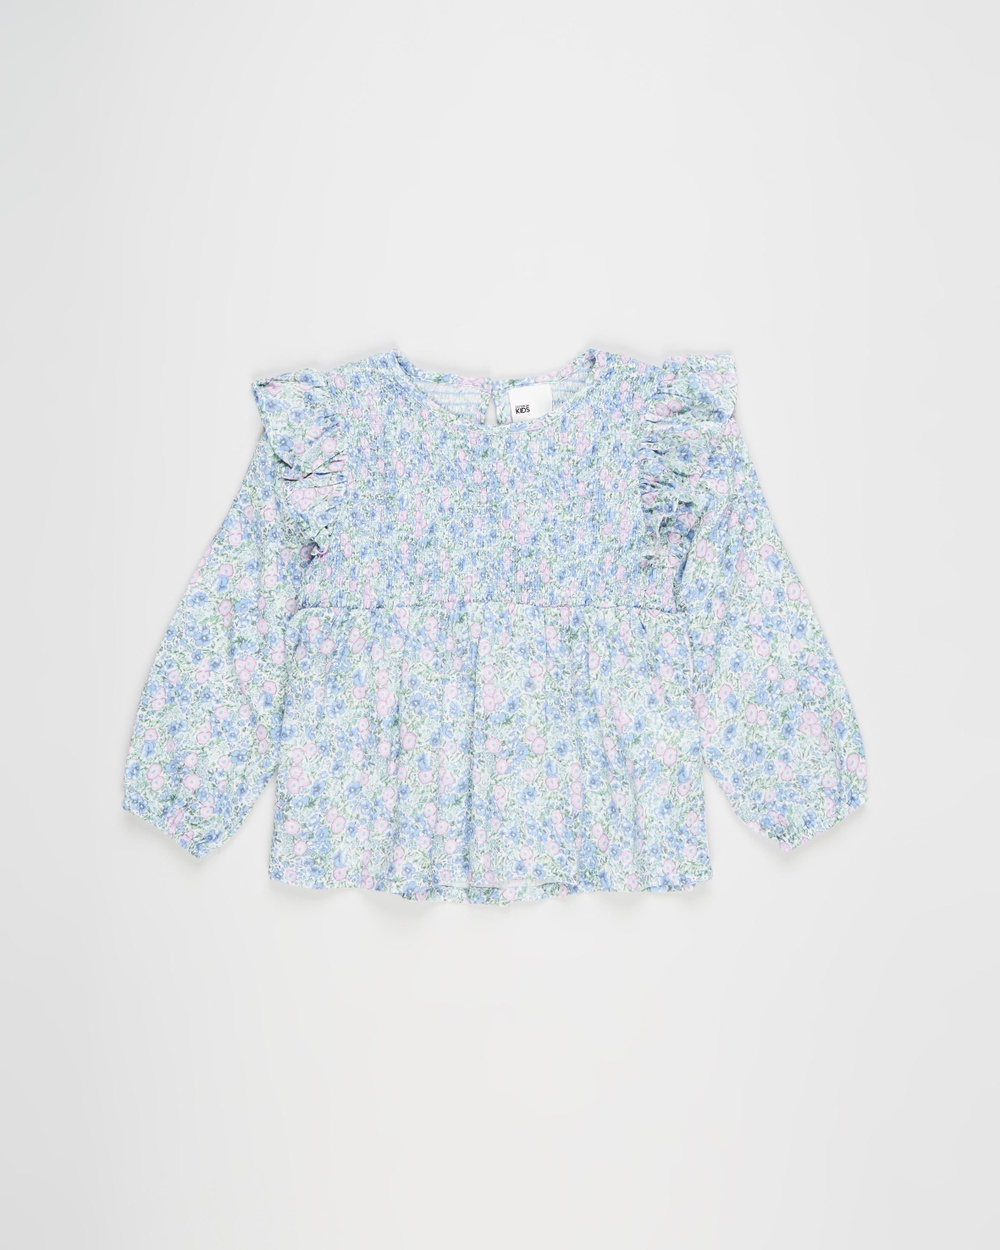 Cotton On Kids - Jaki Fashion Long Sleeve Top    Kids - Tops (Vanilla & Vintage Floral) Jaki Fashion Long Sleeve Top -  Kids